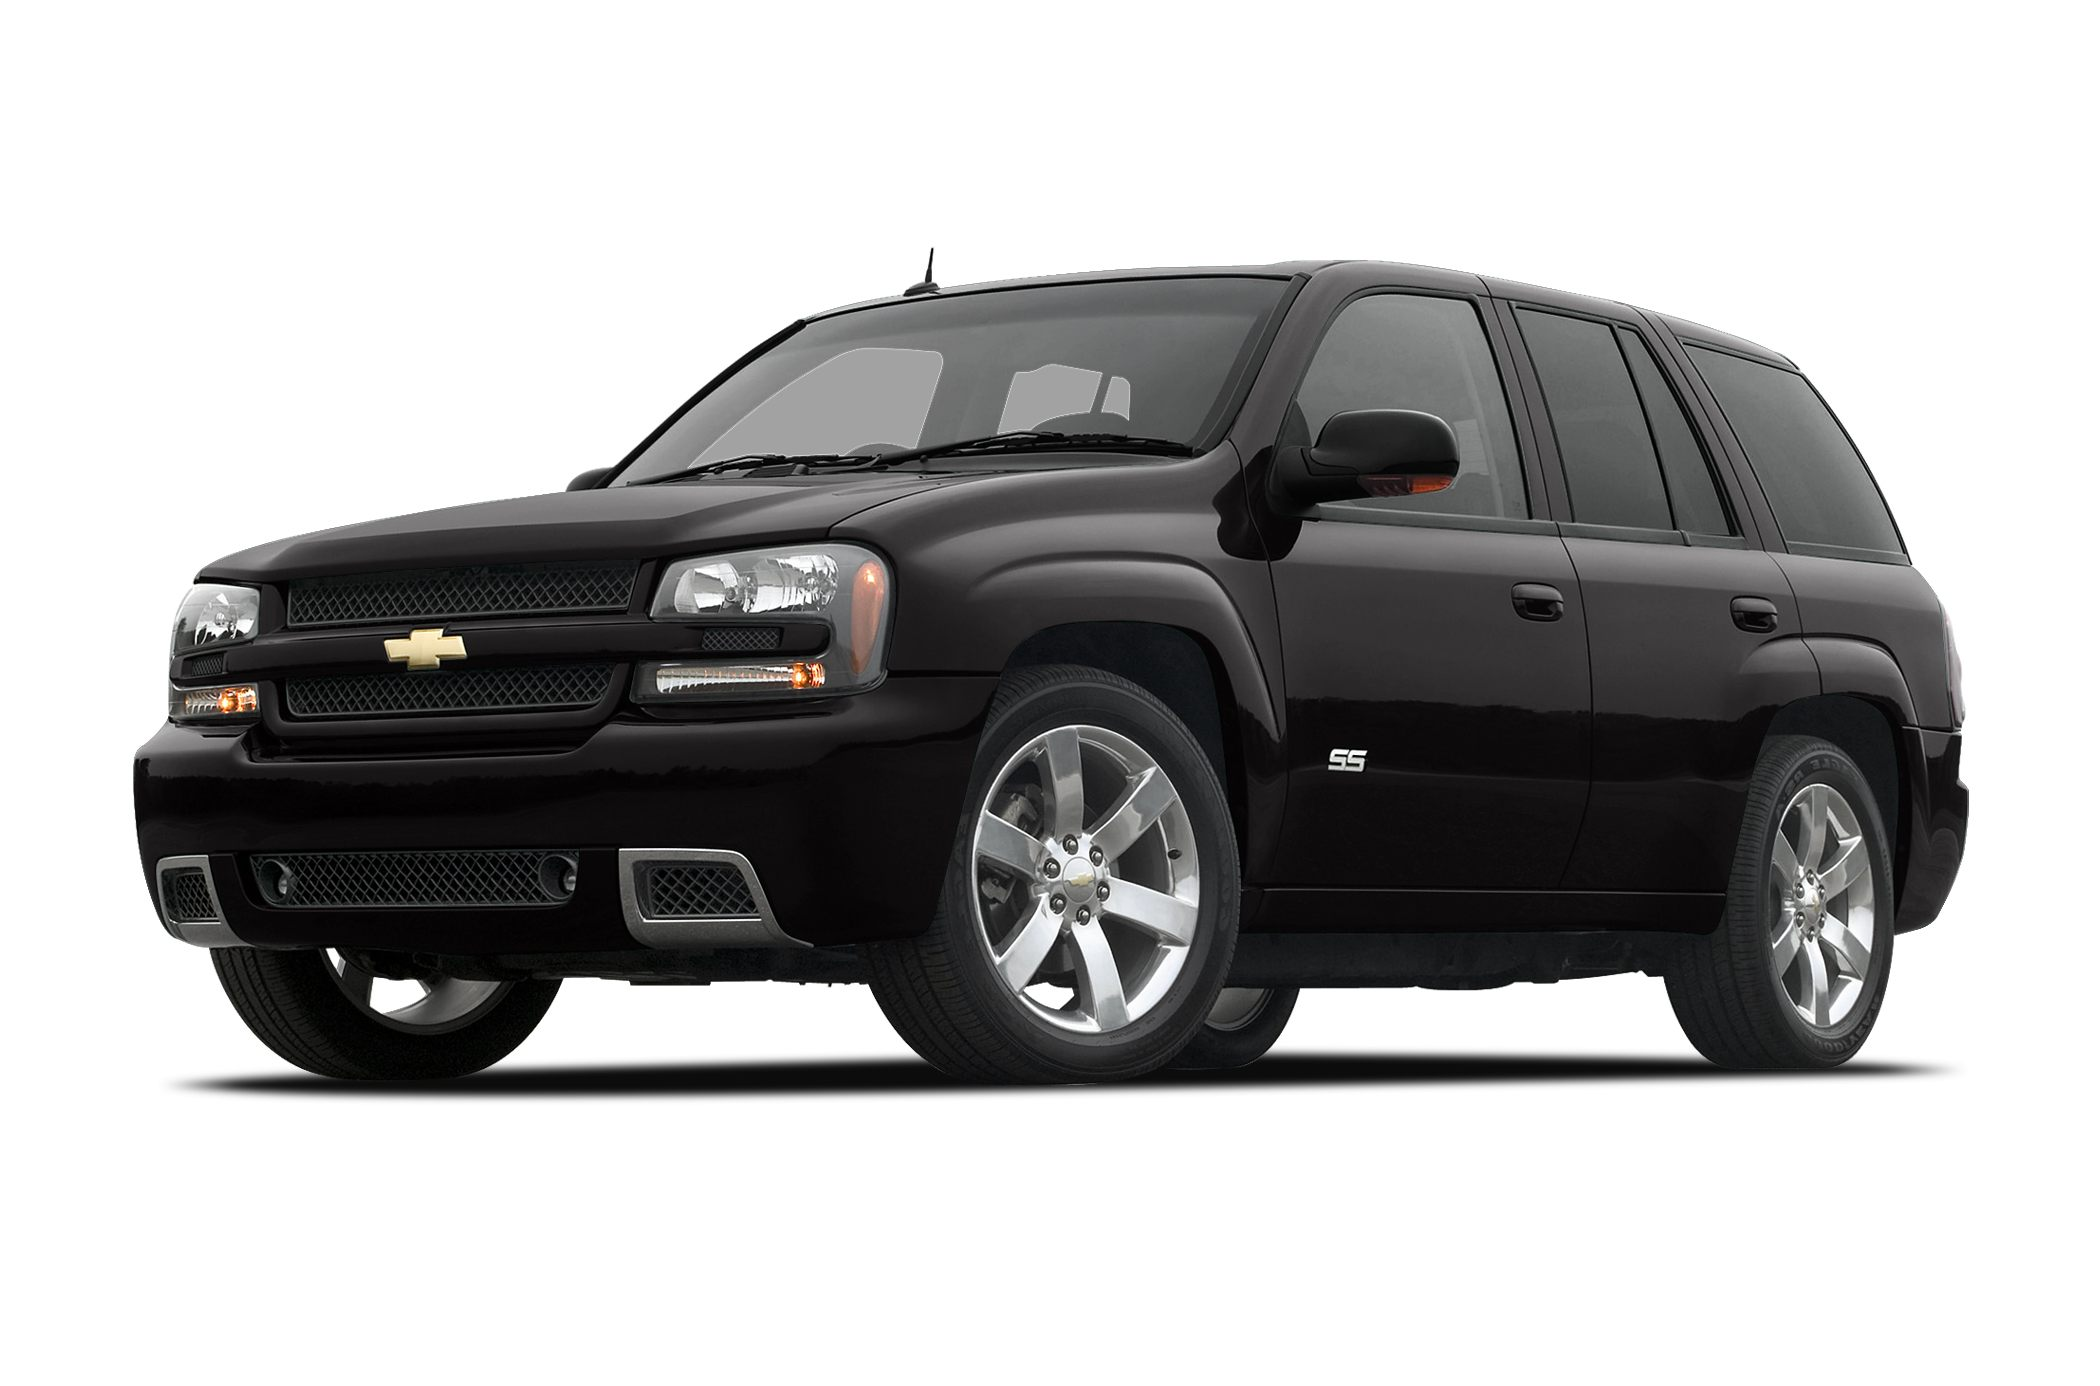 Chevy Blazer 4x4 >> Chevrolet TrailBlazer Recalls | Cars.com